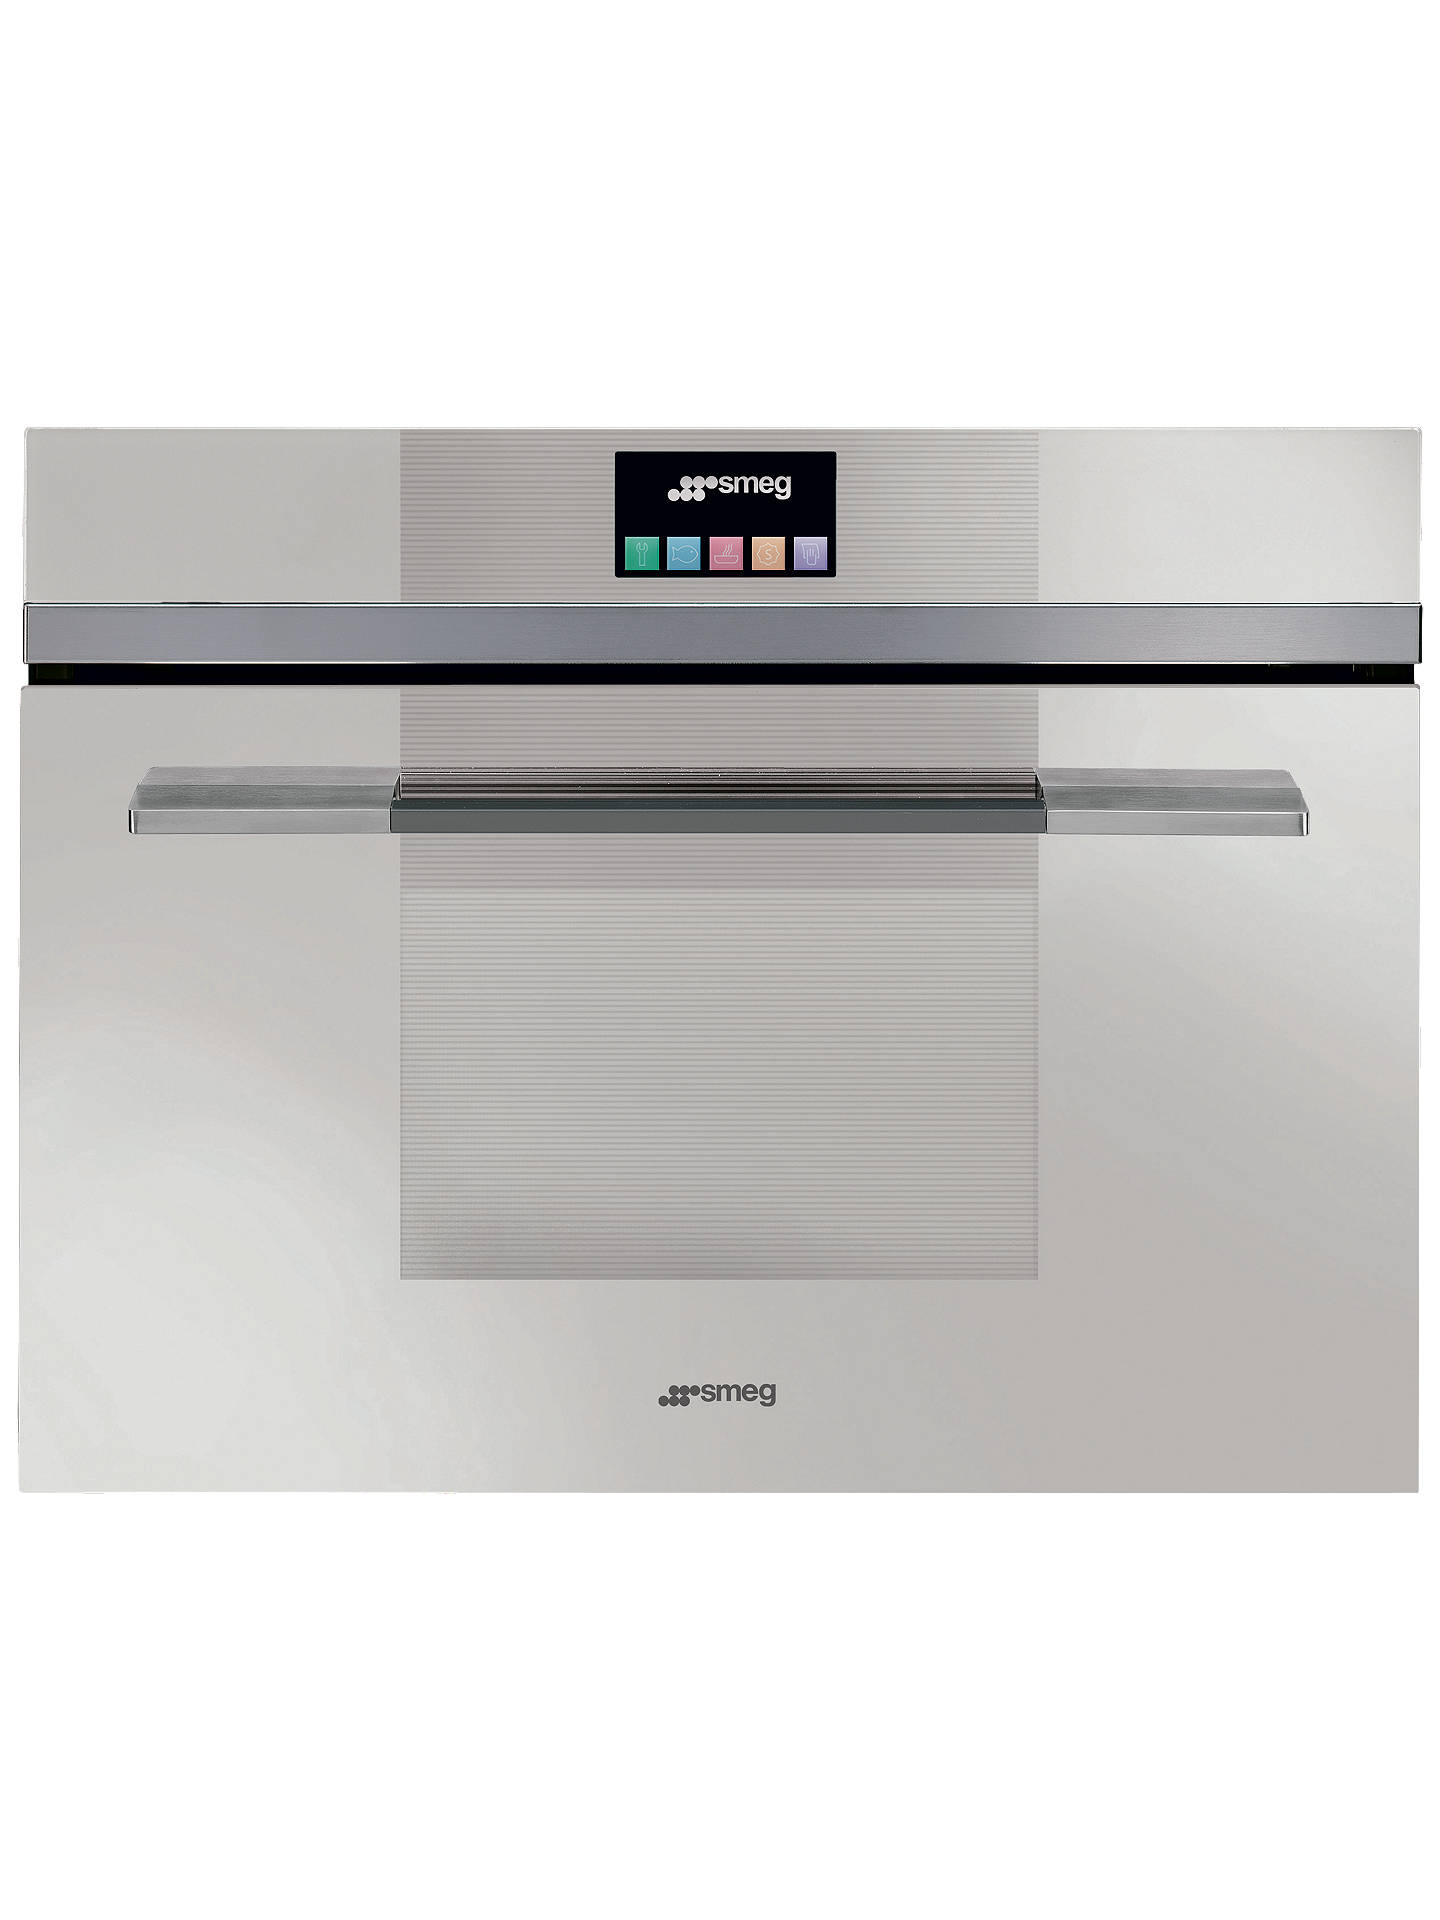 Smeg Sf4140mcb Linea Aesthetic Combination Microwave Oven